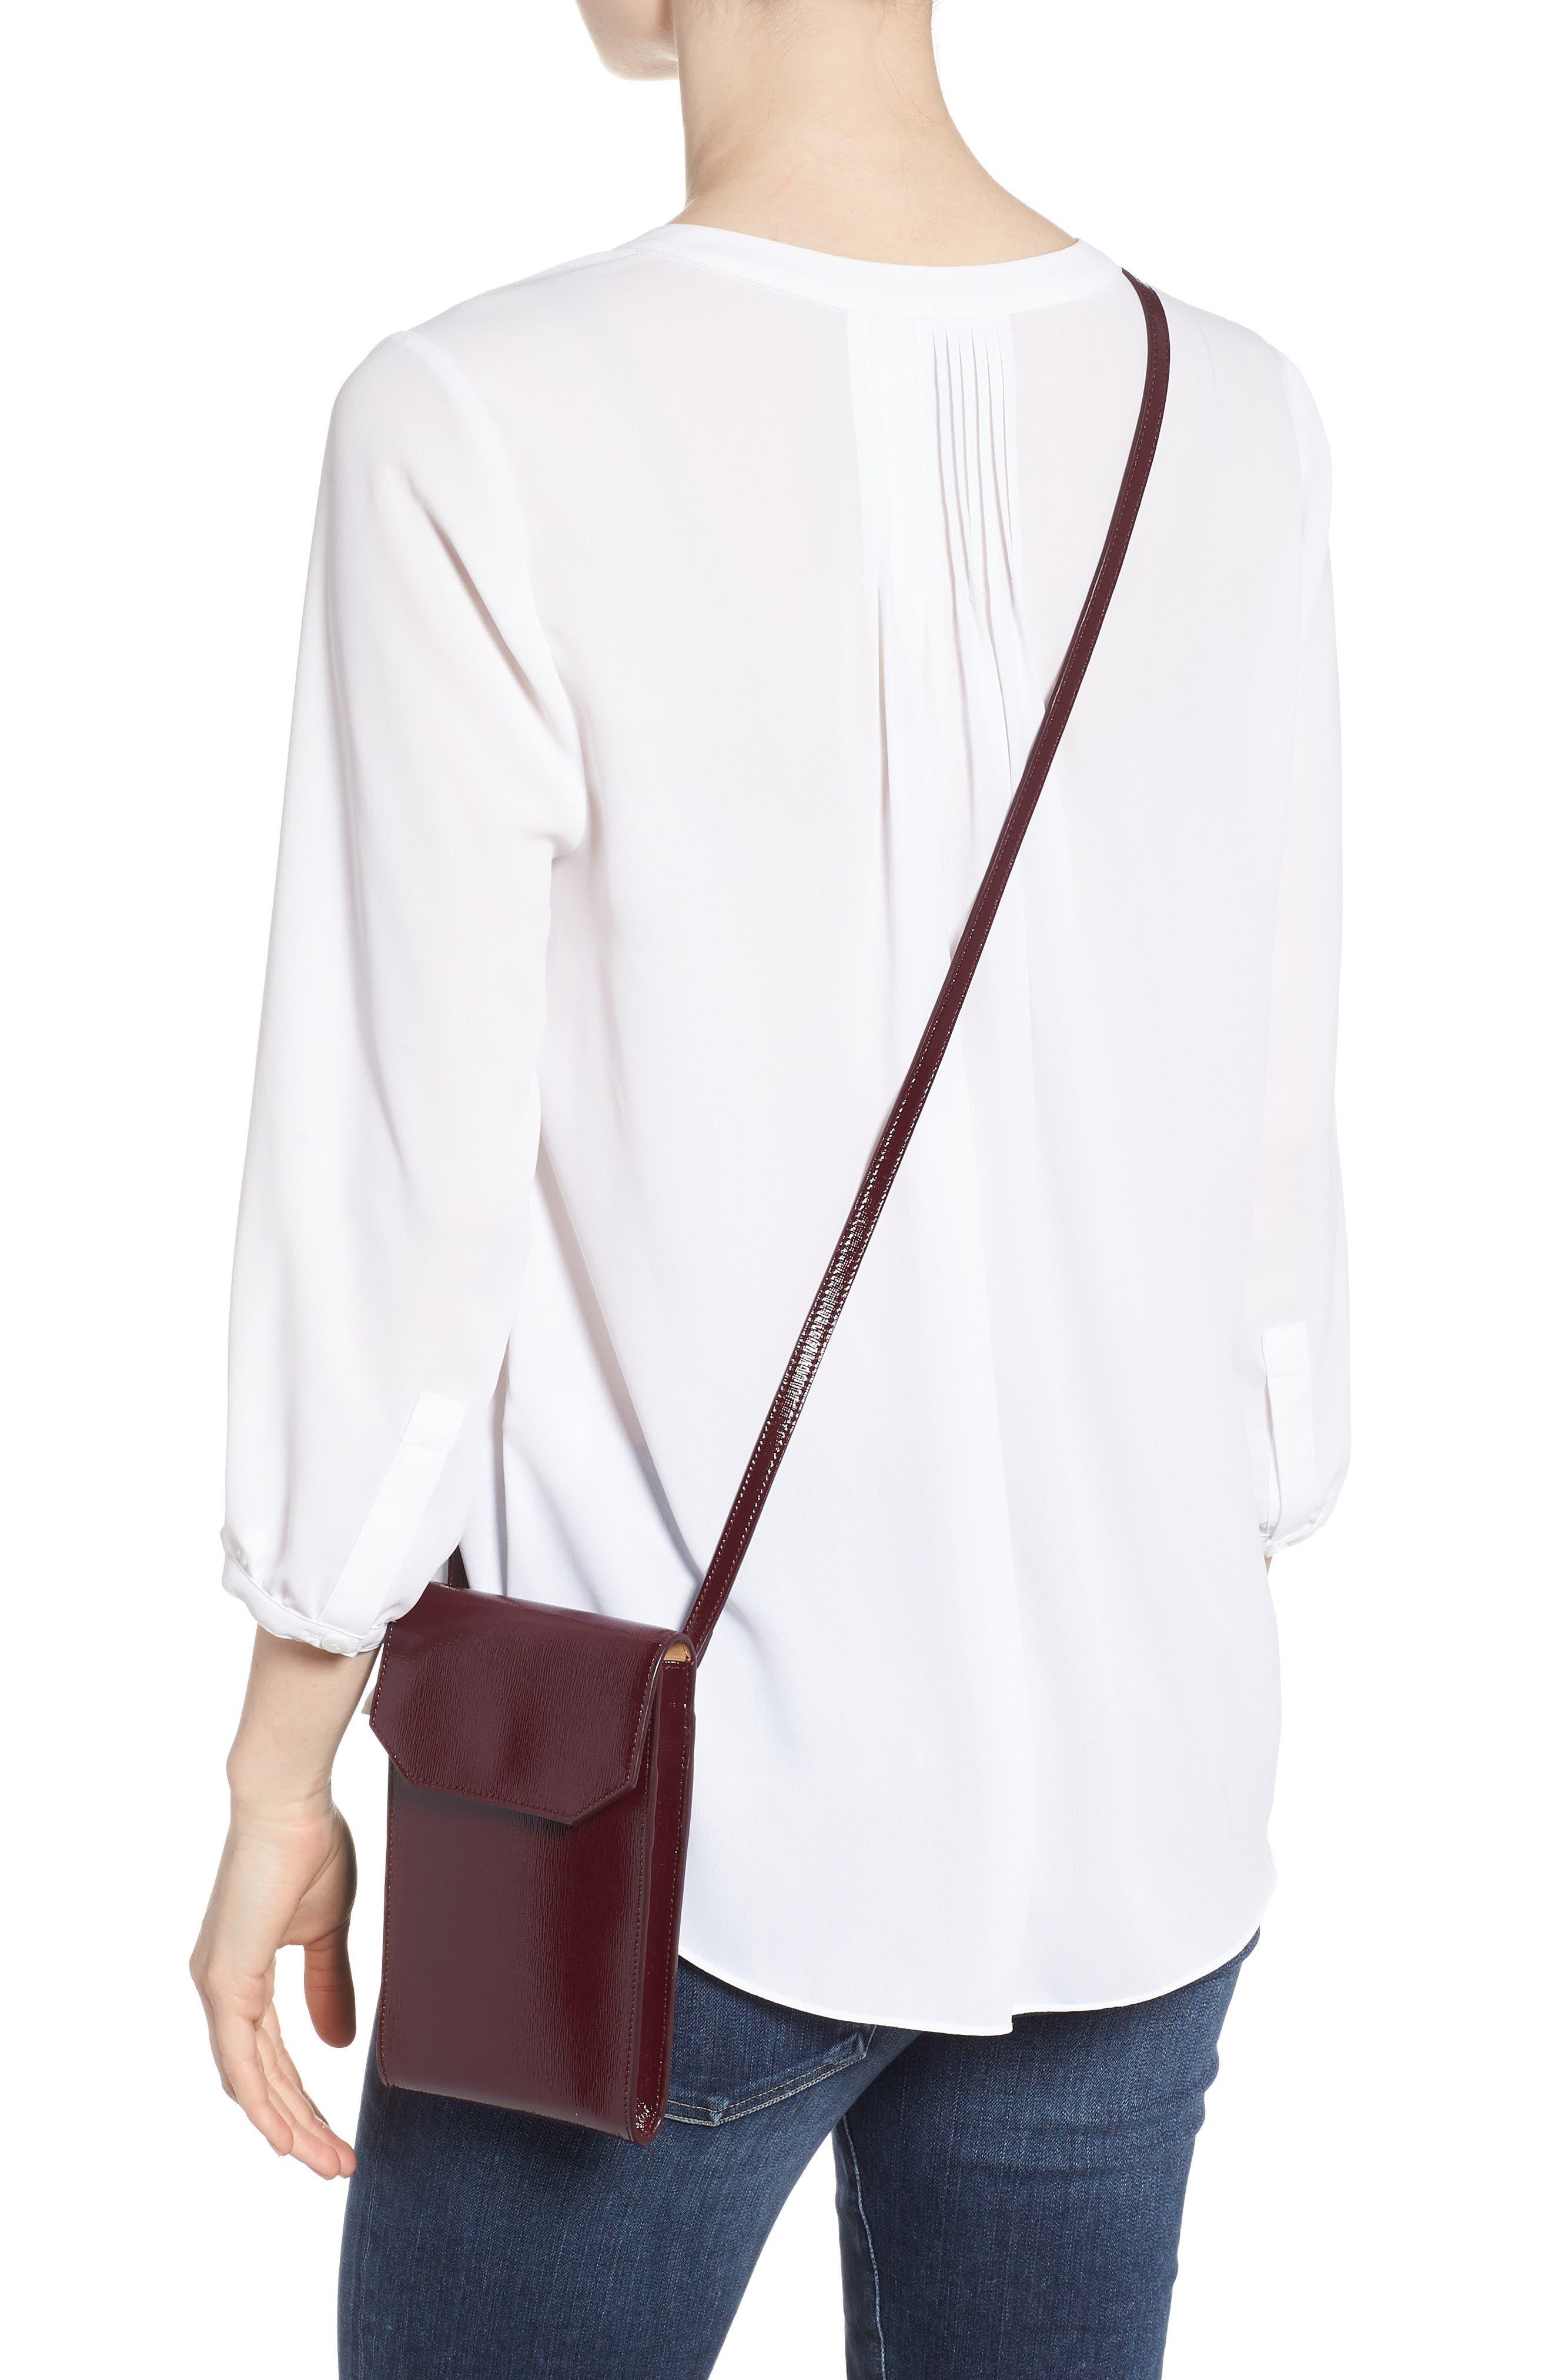 Leather Phone Crossbody Bag,                             Alternate thumbnail 2, color,                             Burgundy Royale